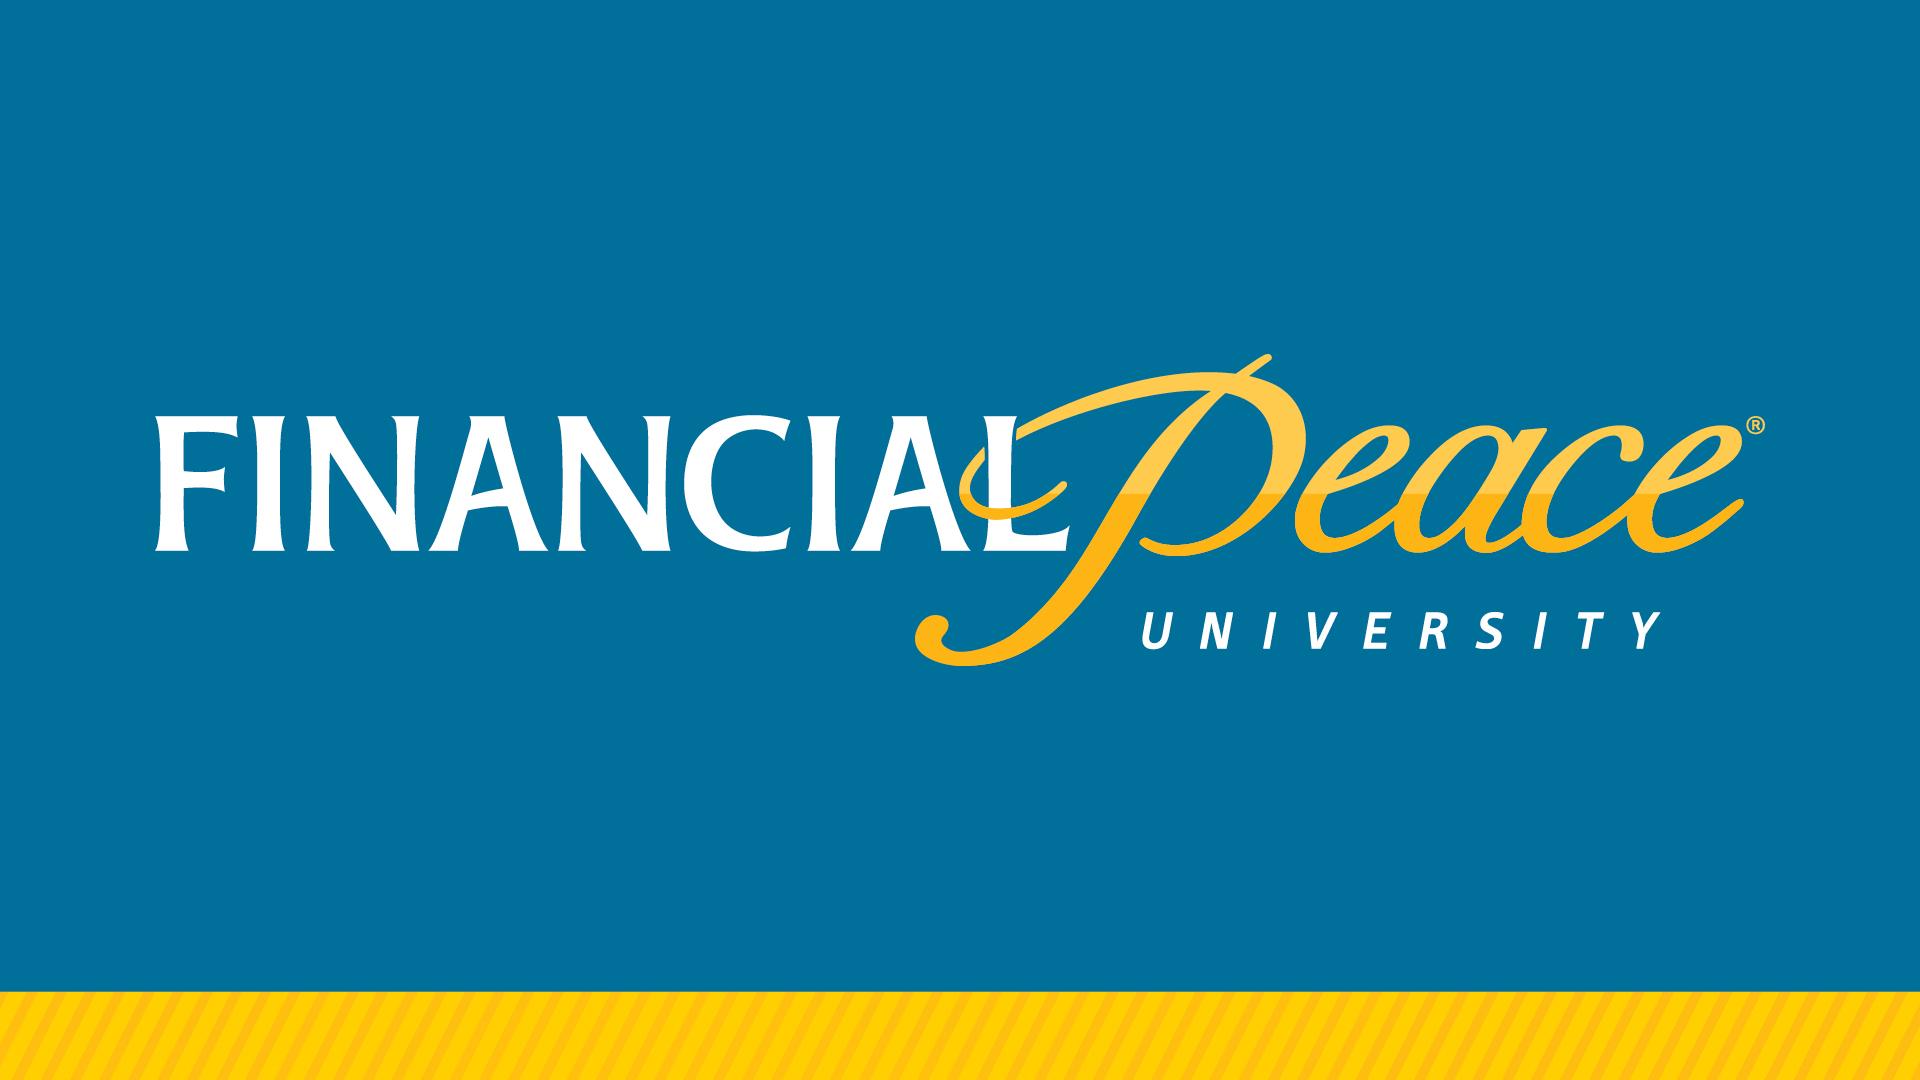 financial peace .jpg